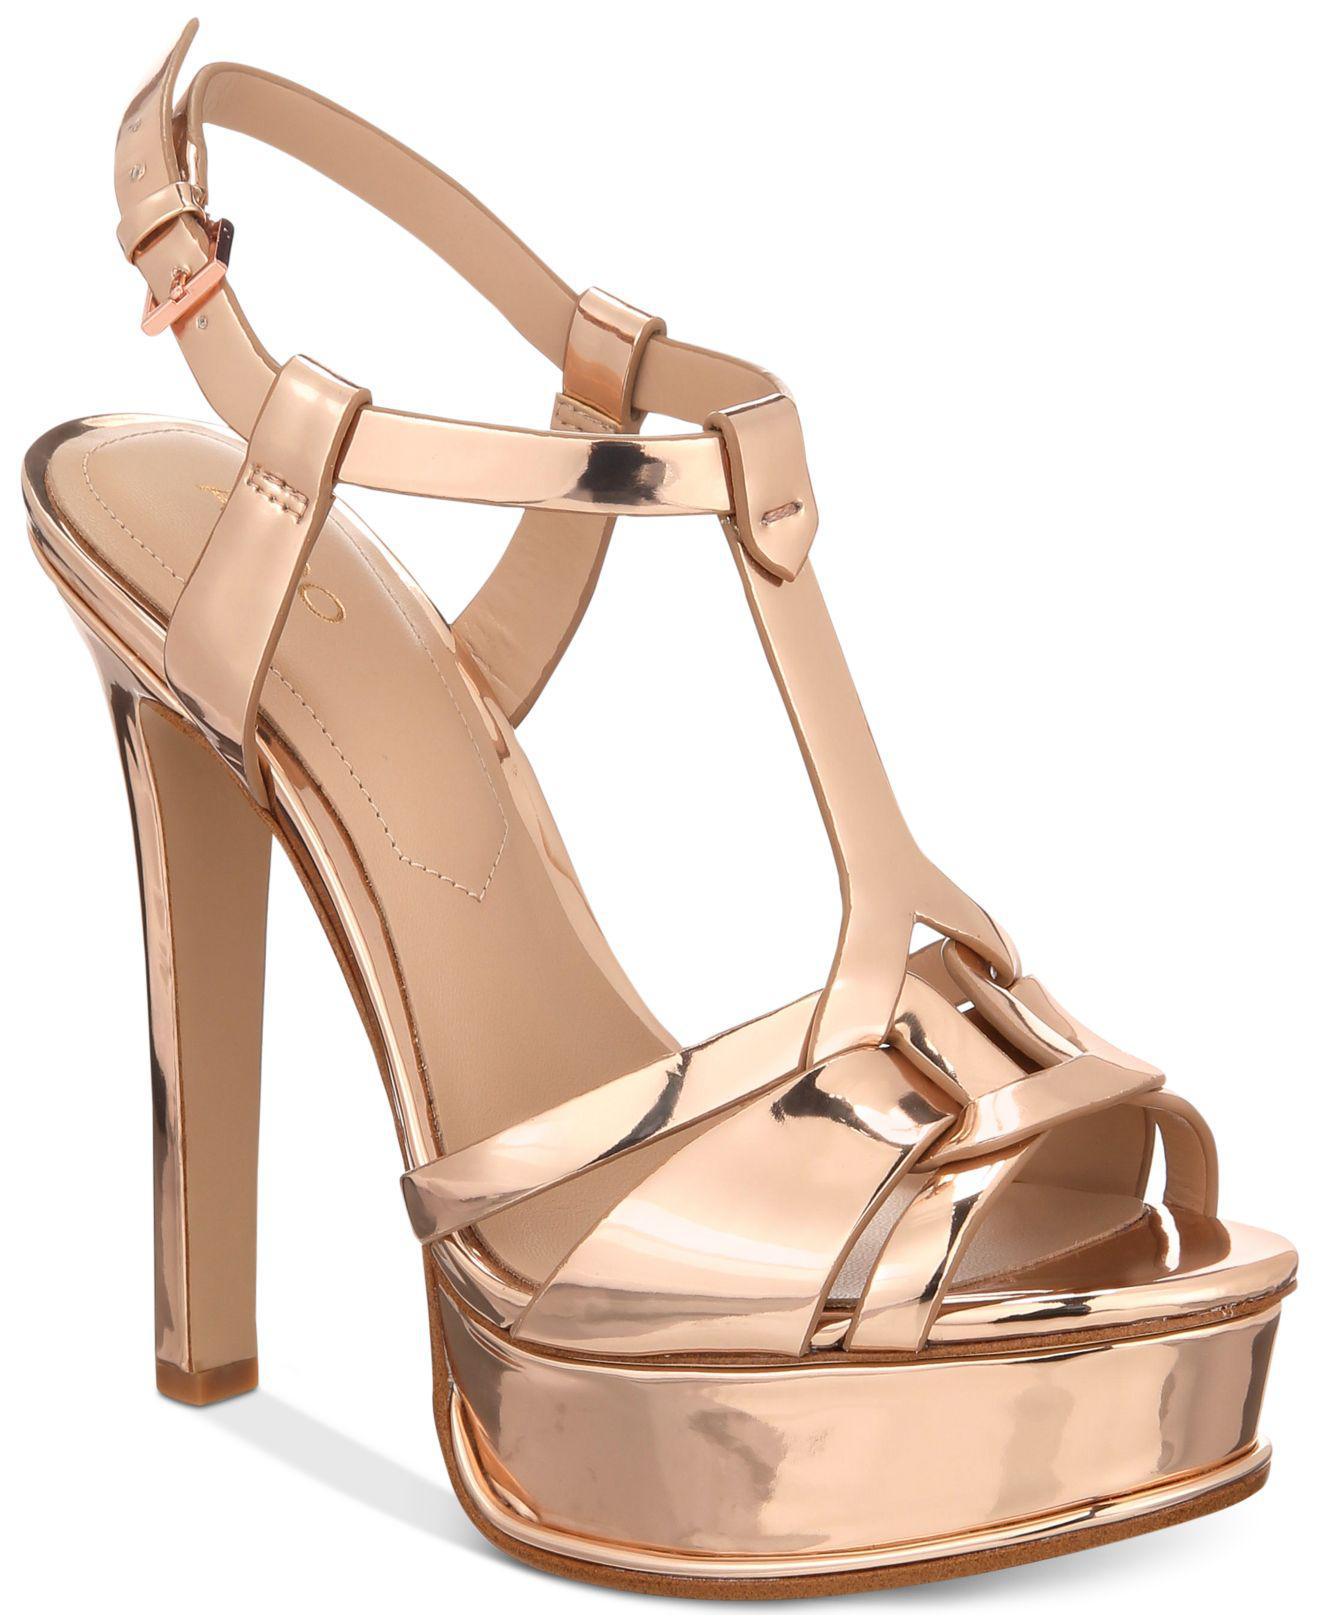 9d5be7ea152 Lyst - ALDO Chelly Platform Dress Sandals